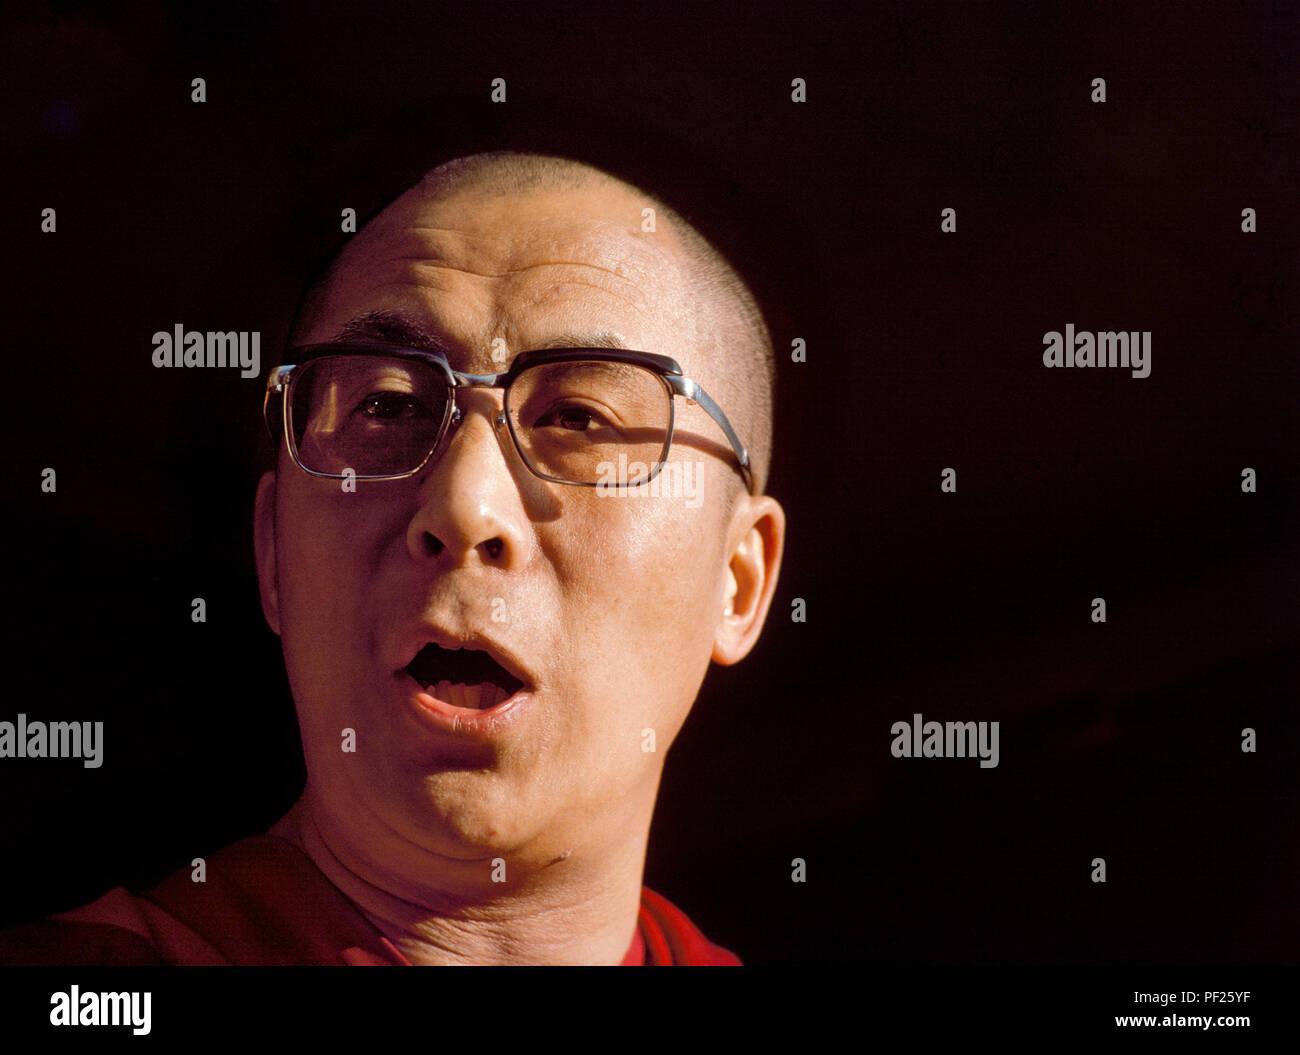 Dalai Lama his holiness 14th spiritual Leader of Tibetan Buddhists community Living in McLeod Ganj, Dharamsala, Himachal Pradesh, India. - Stock Image